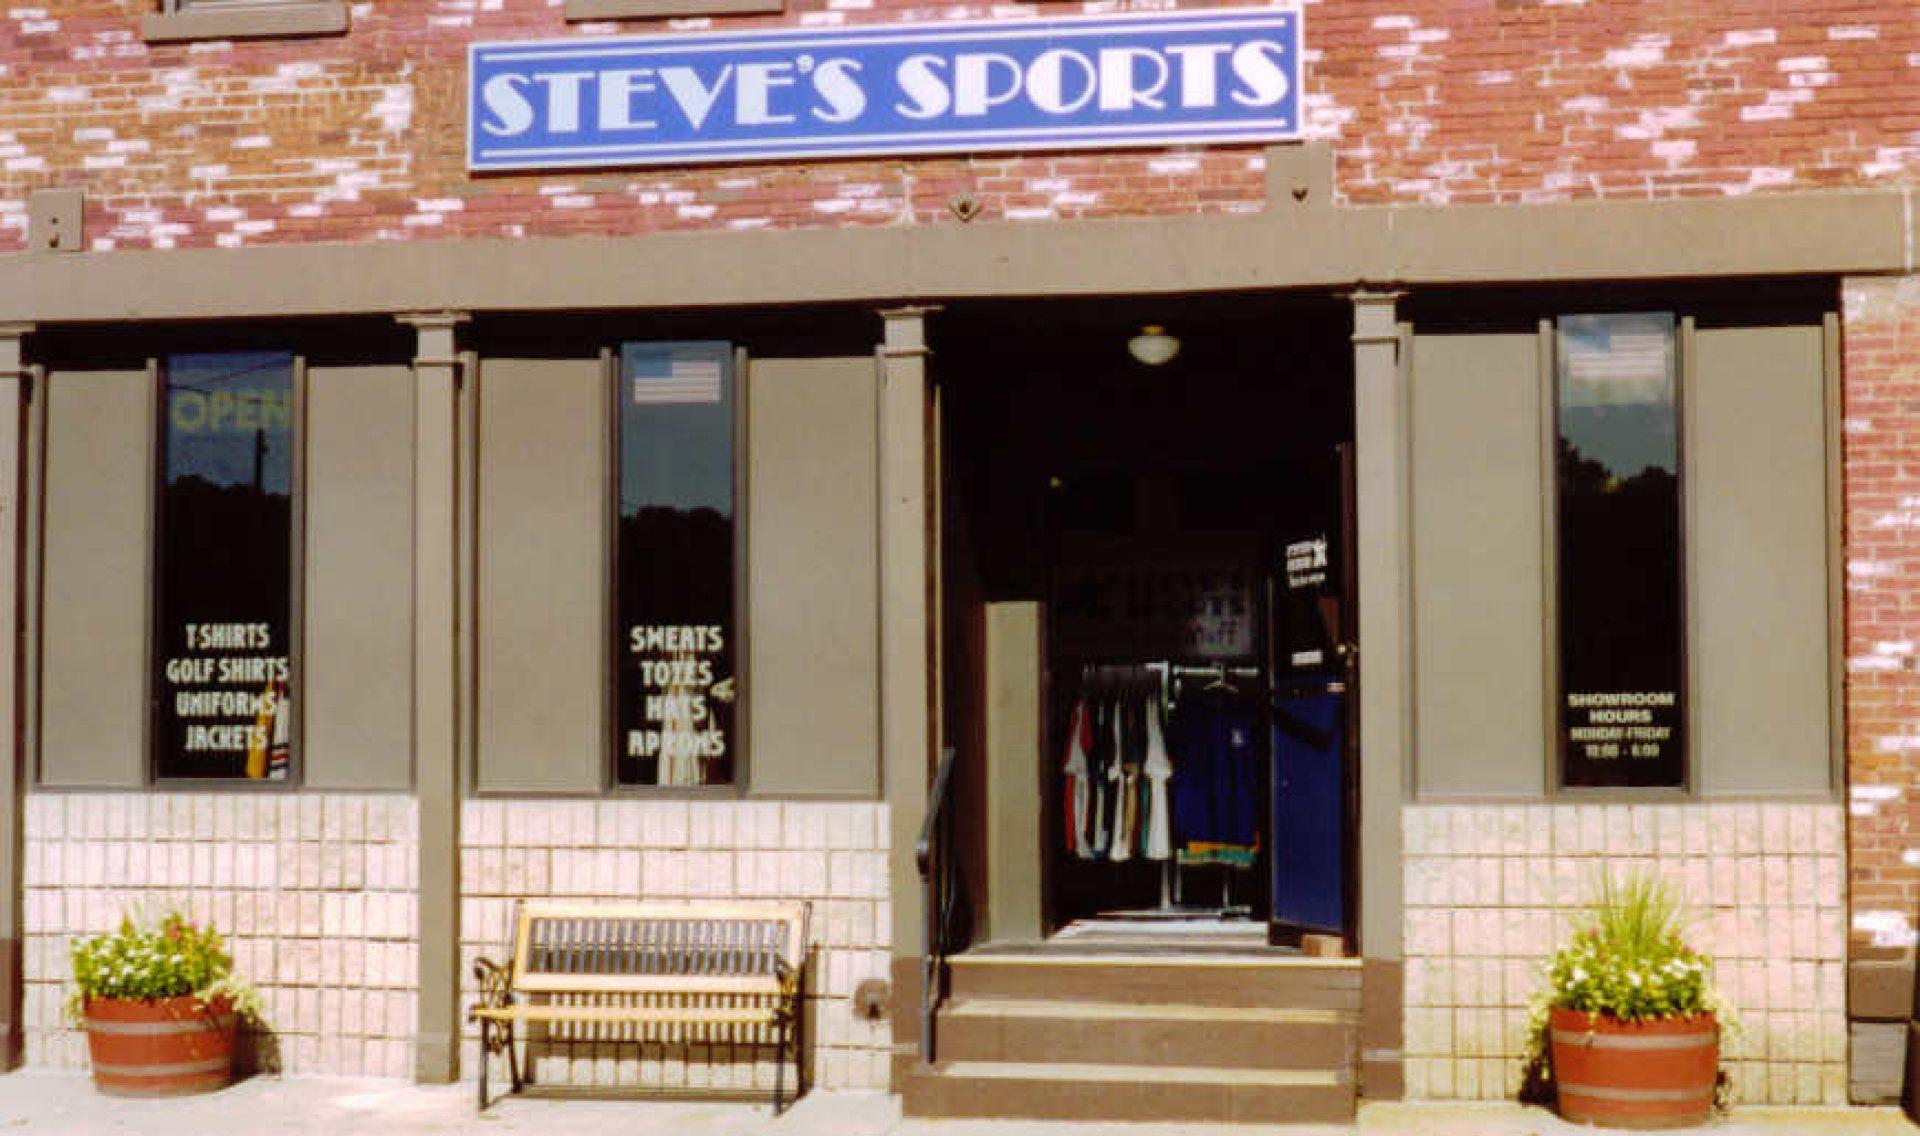 STEVE'S SPORTS